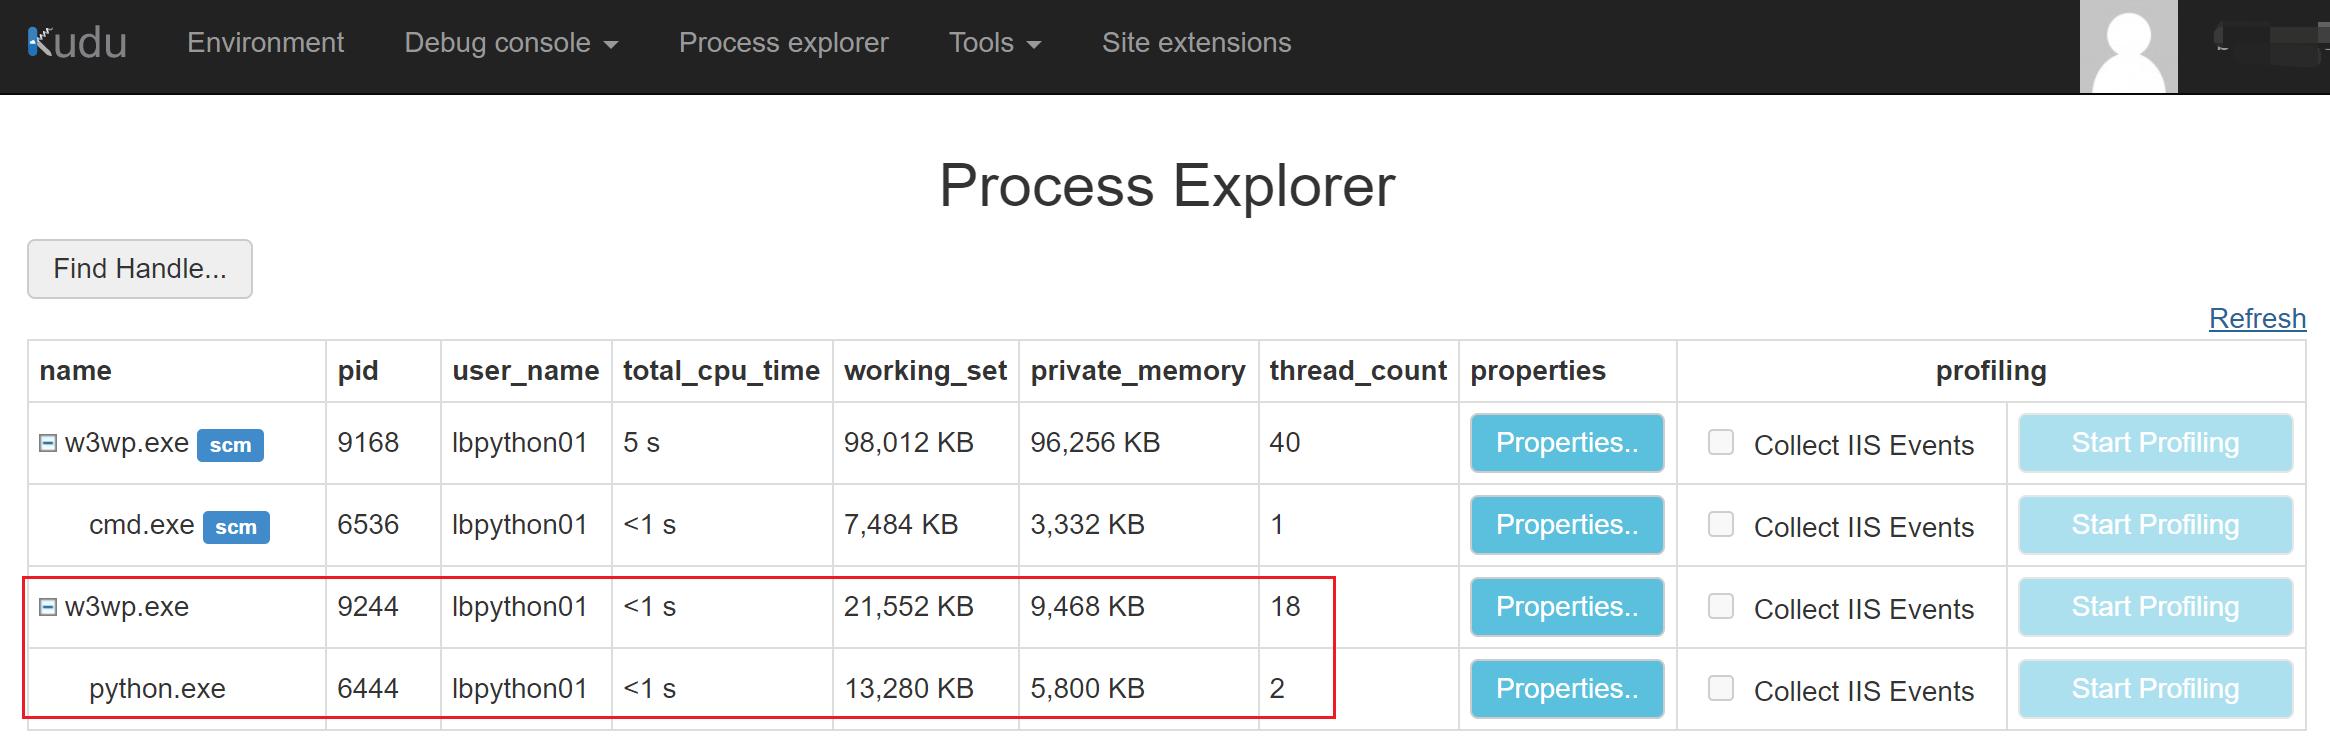 【Azure 應用服務】App Service  For Windows 環境中部署Python站點後,如何繼續訪問靜態資原始檔呢(Serving Static Files)?